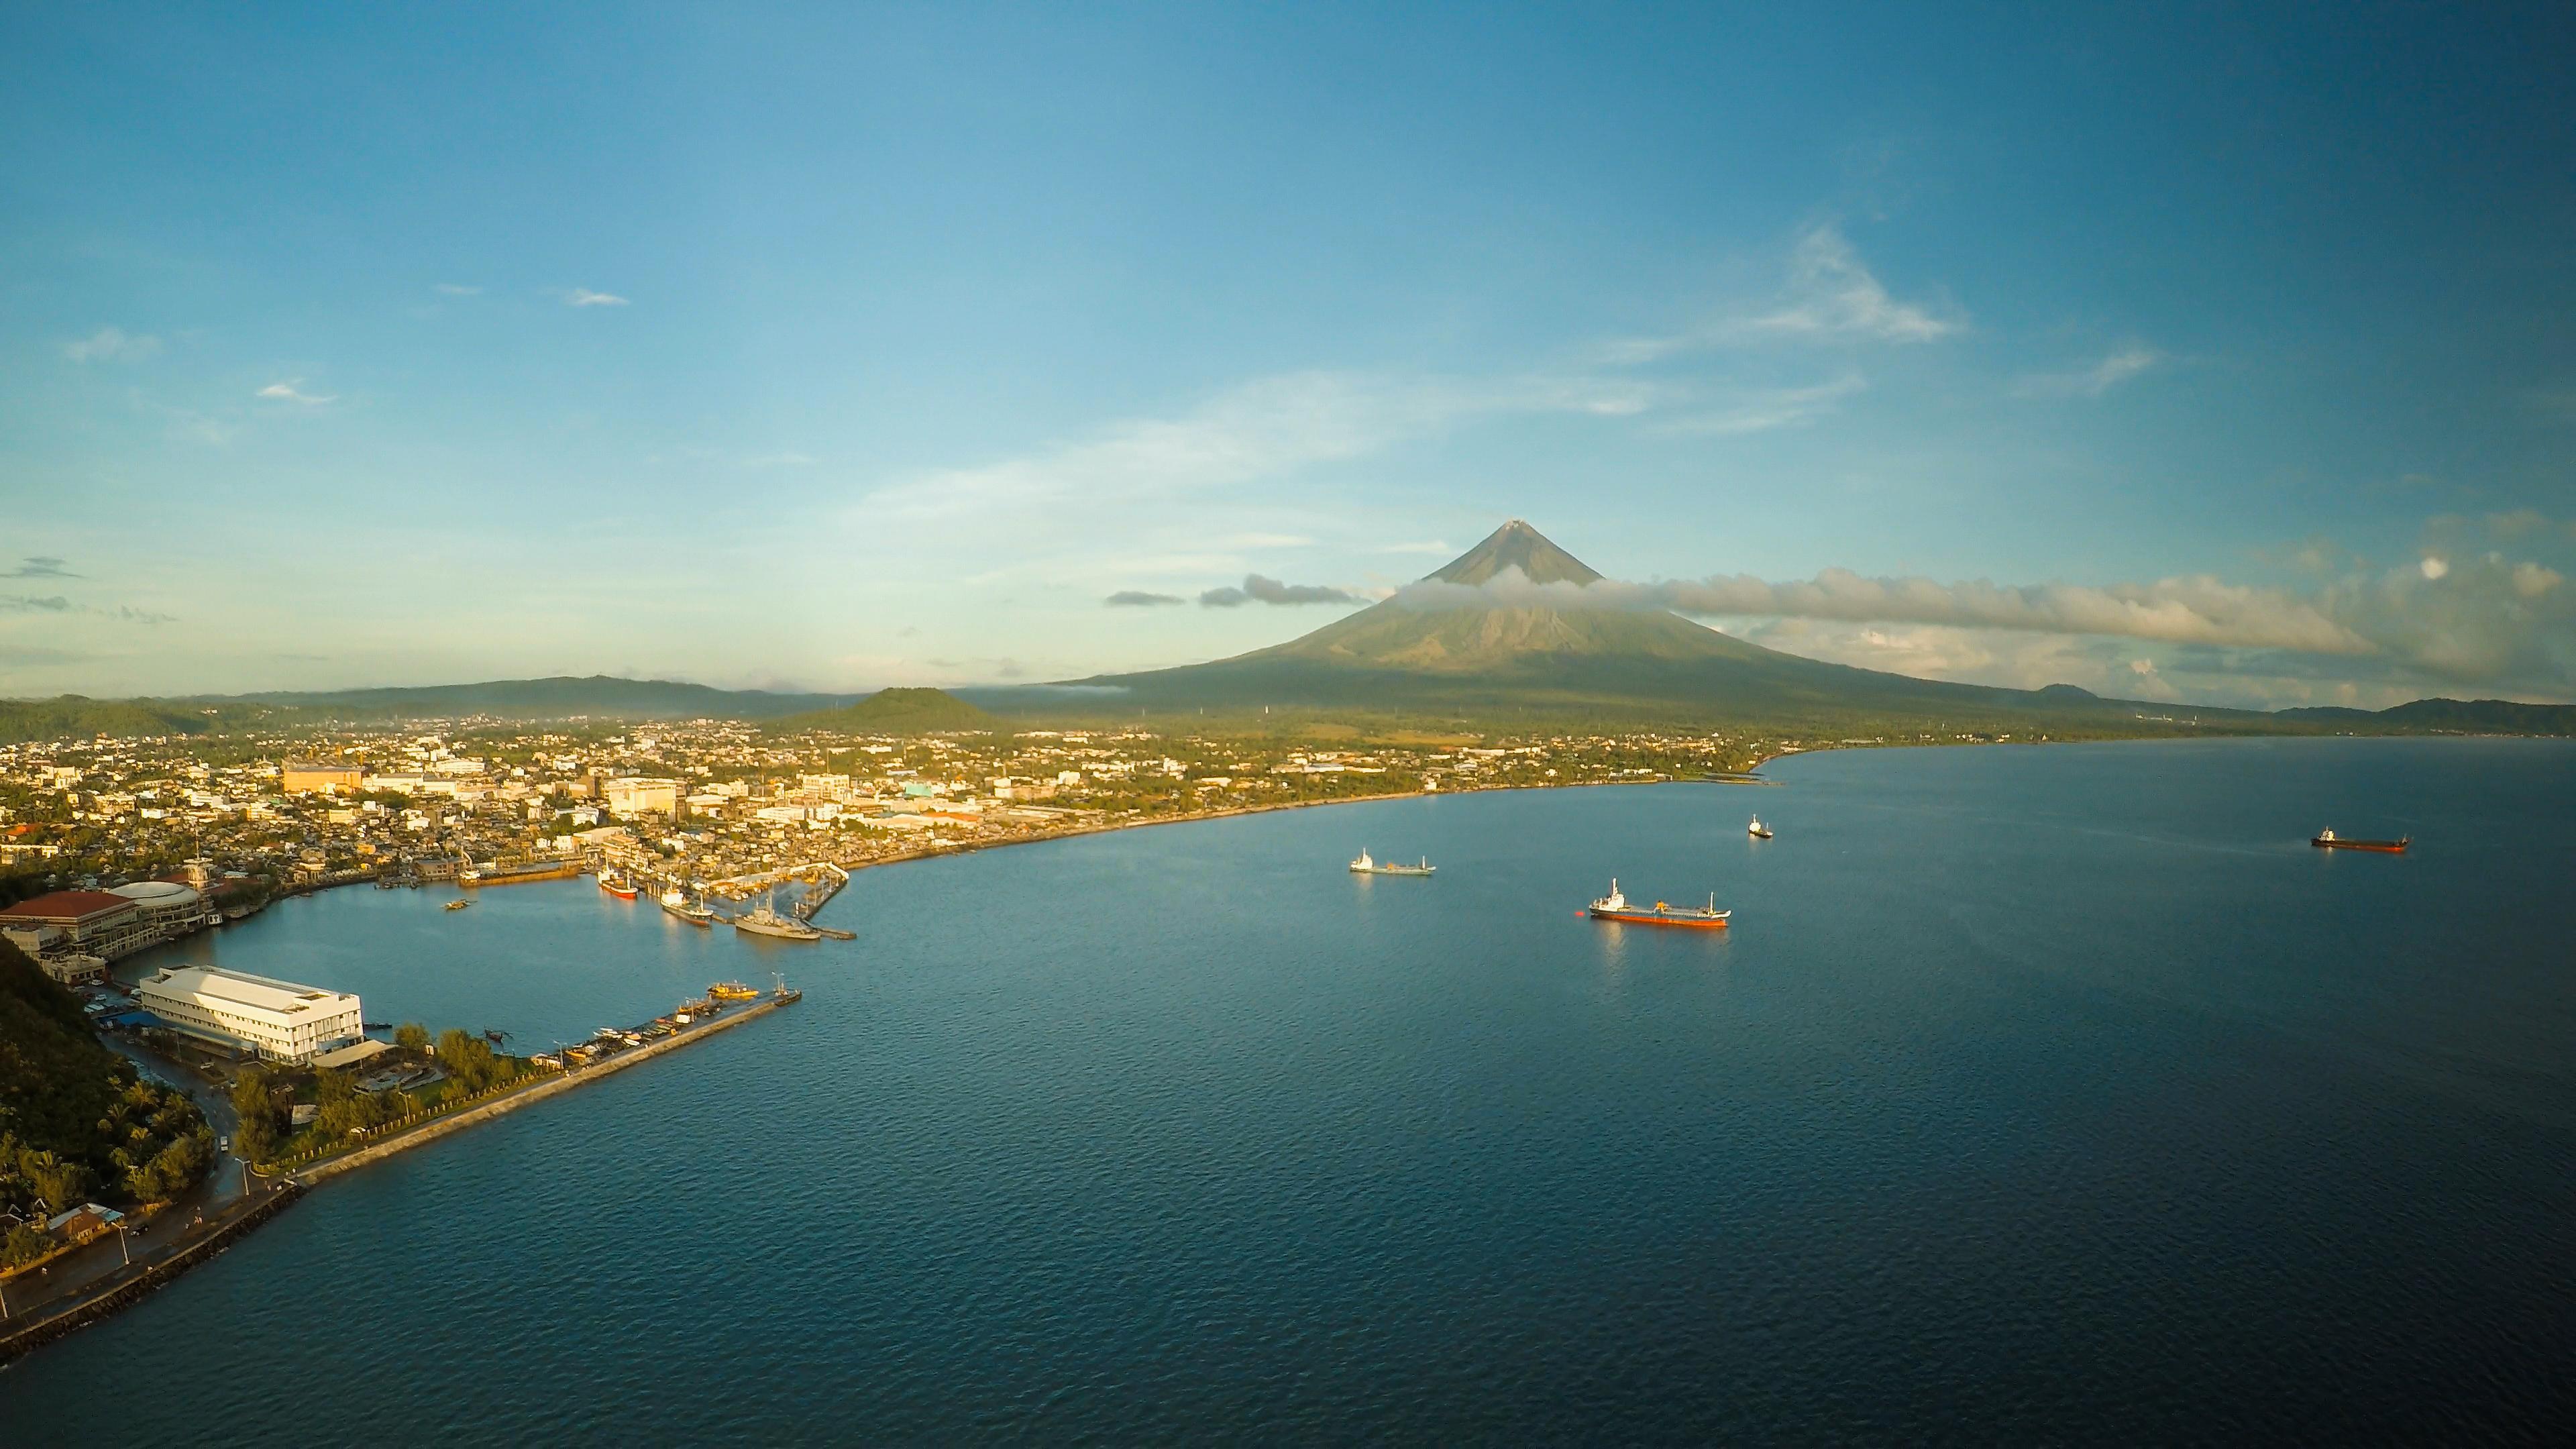 Mayon Volcano and Legazpi Port